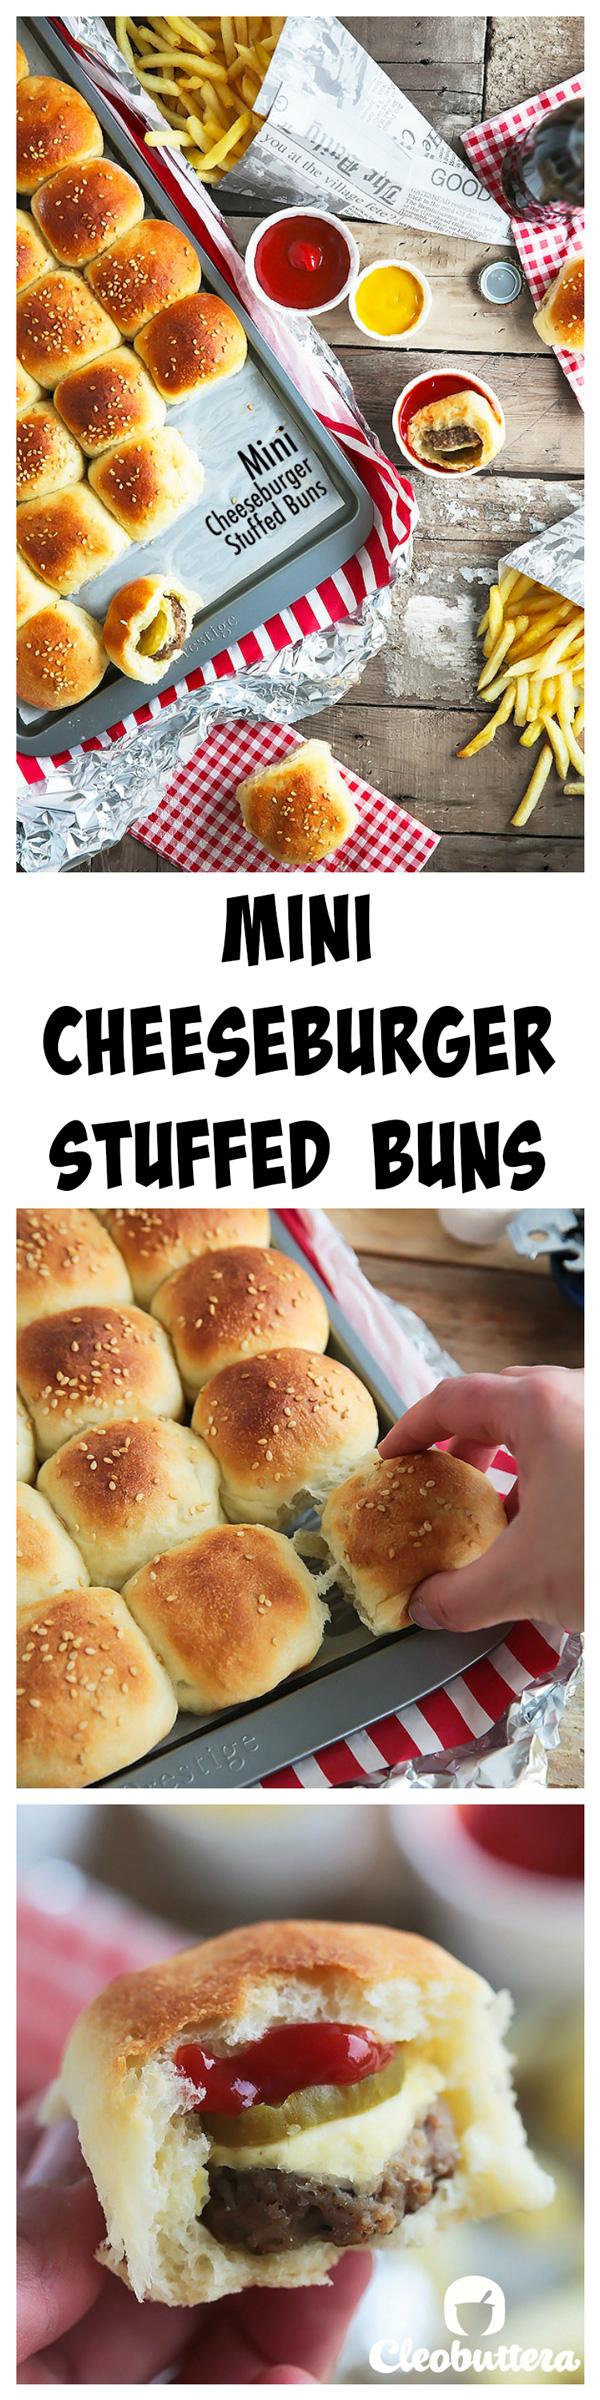 Mini cheeseburger stuffed buns - pinterest